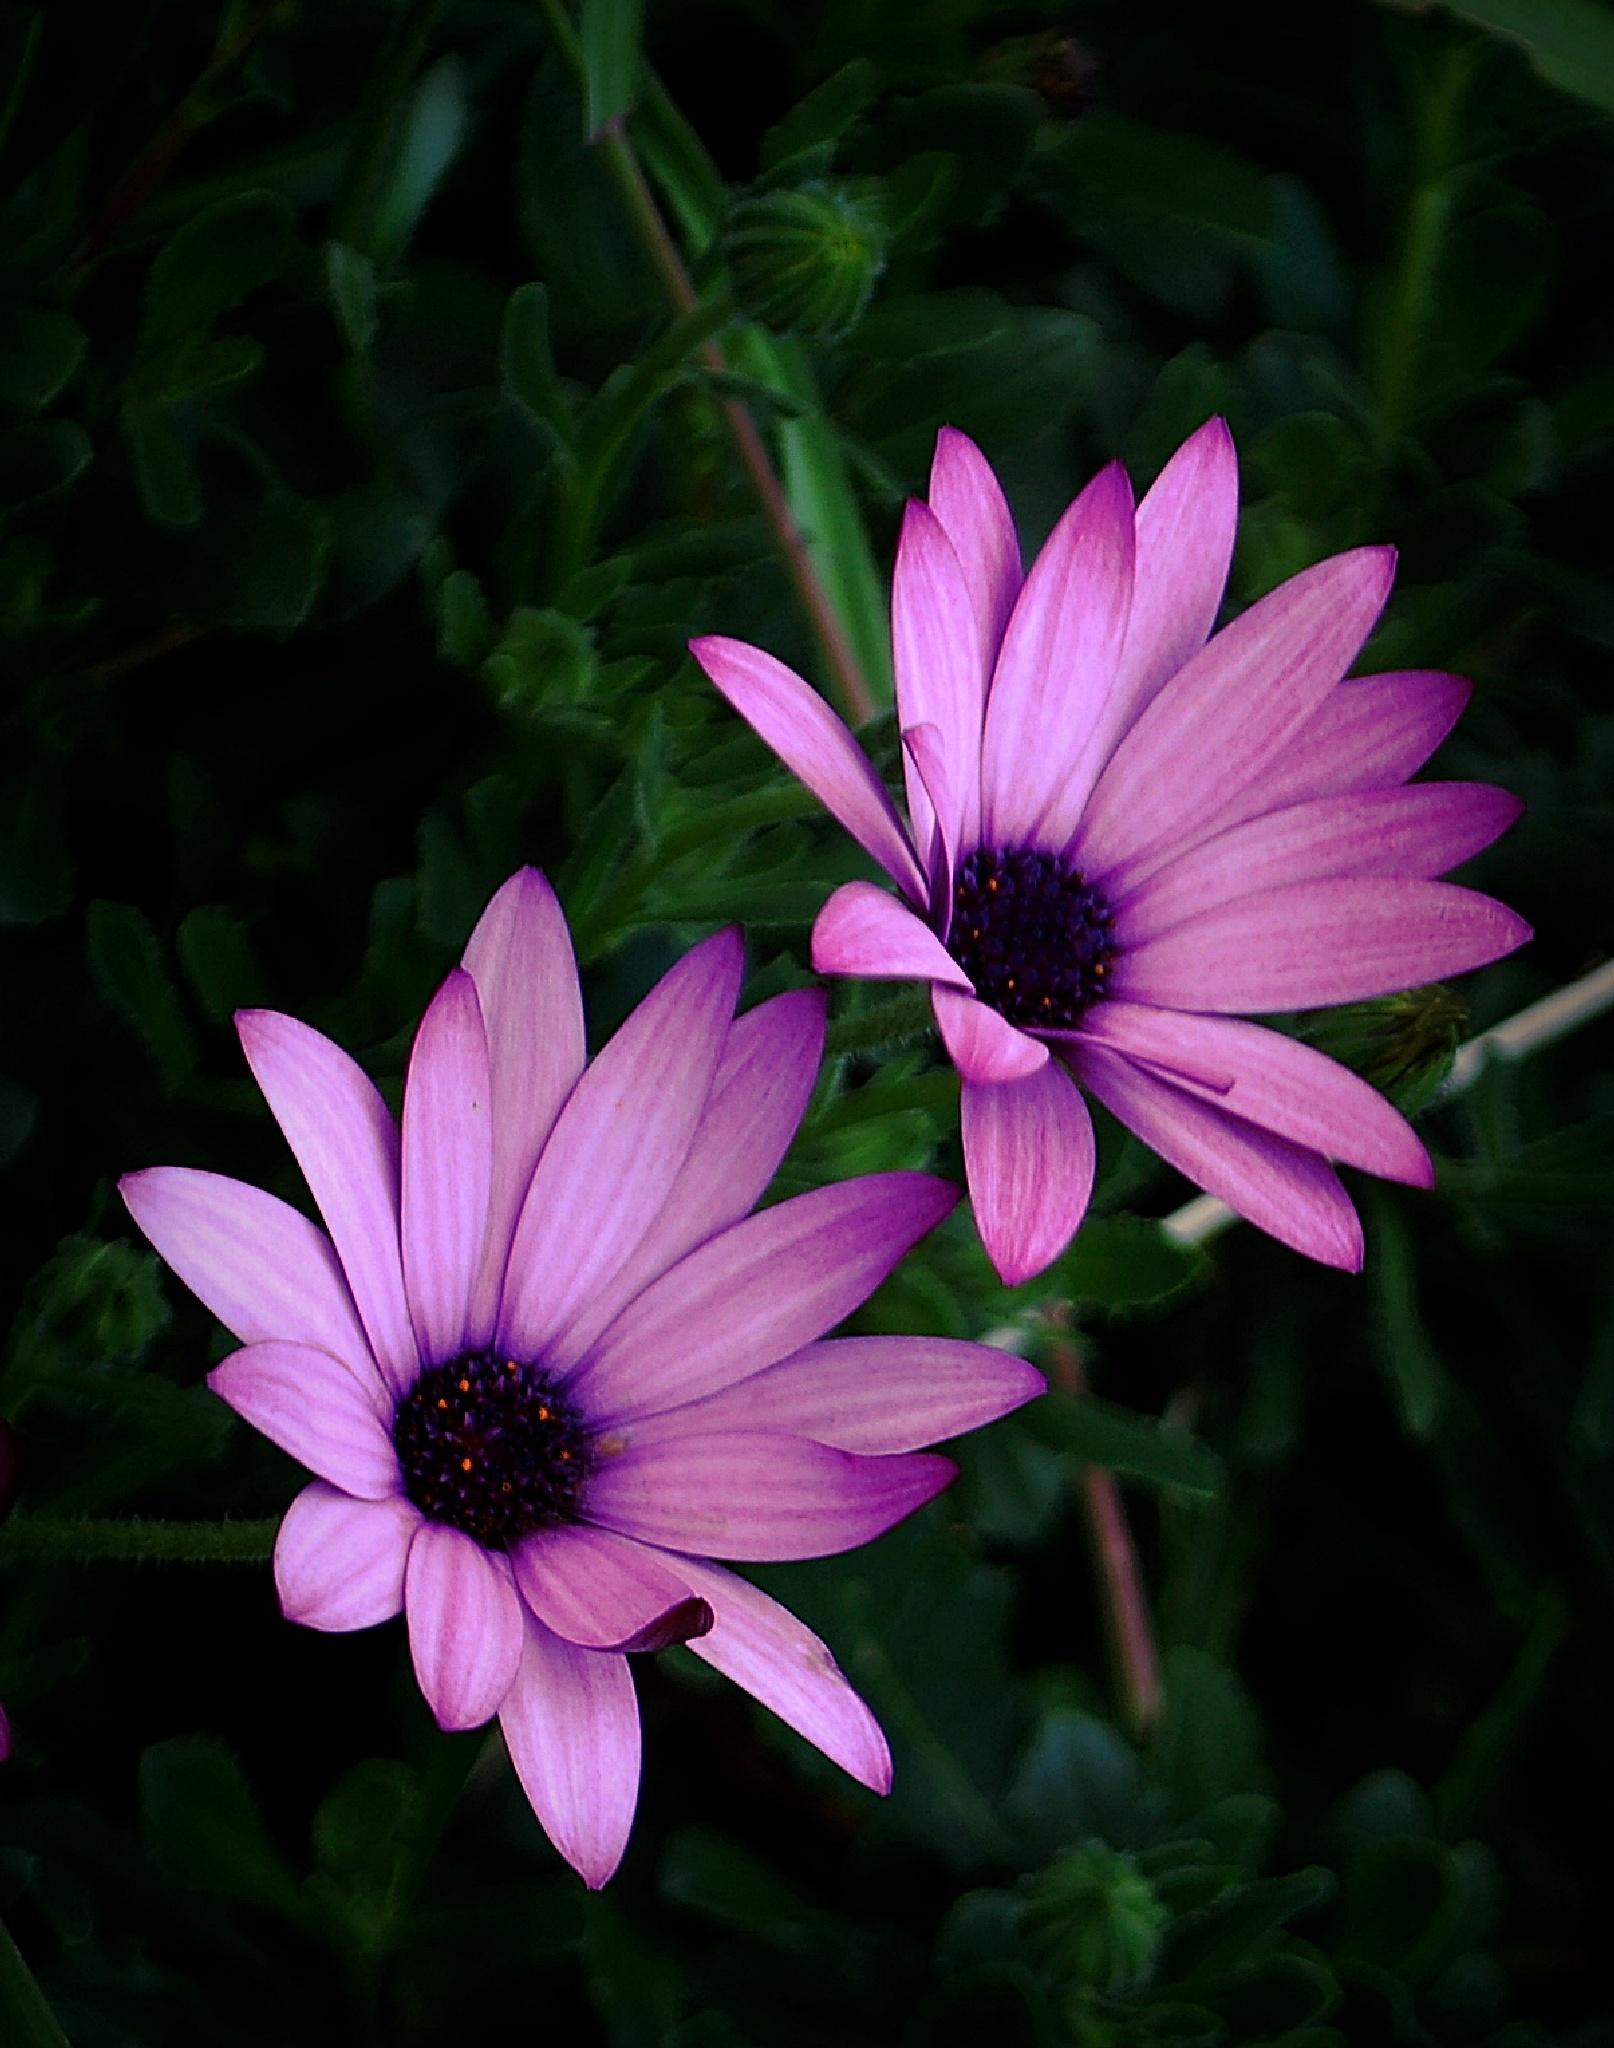 Lilac by ShanthyWijay